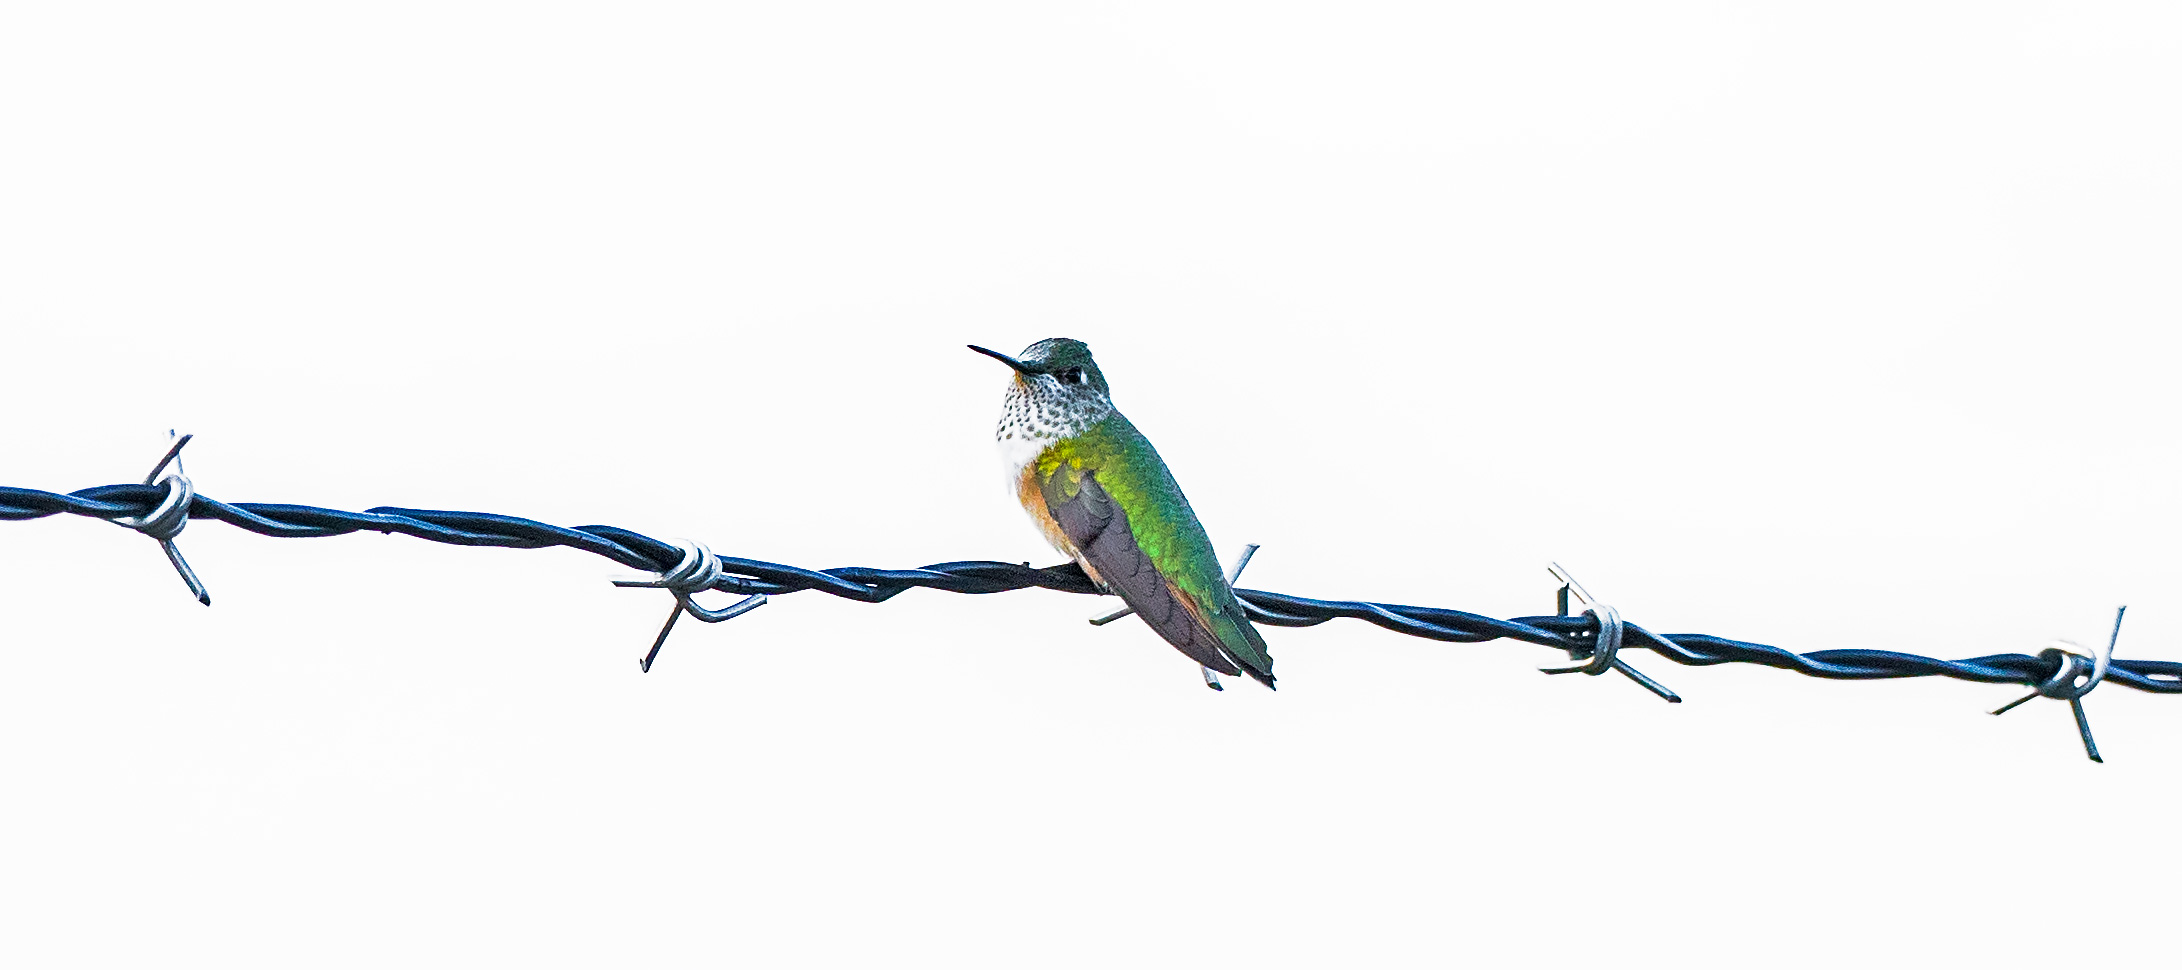 hummingbird, Xeriscape, fence, photo